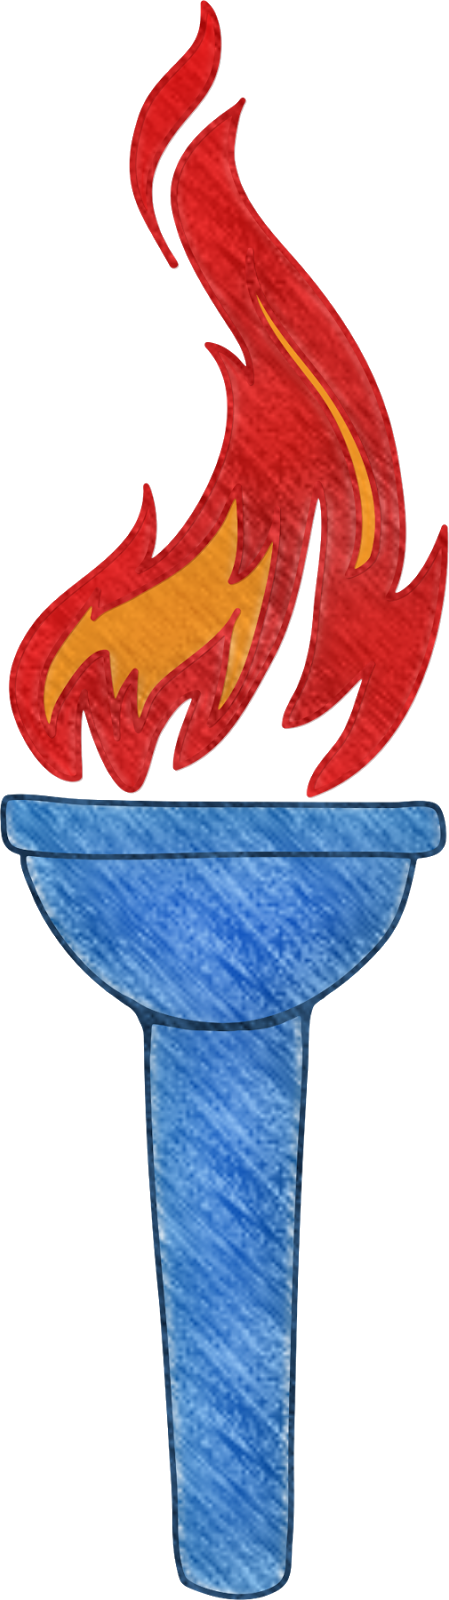 torch clipart blue torch